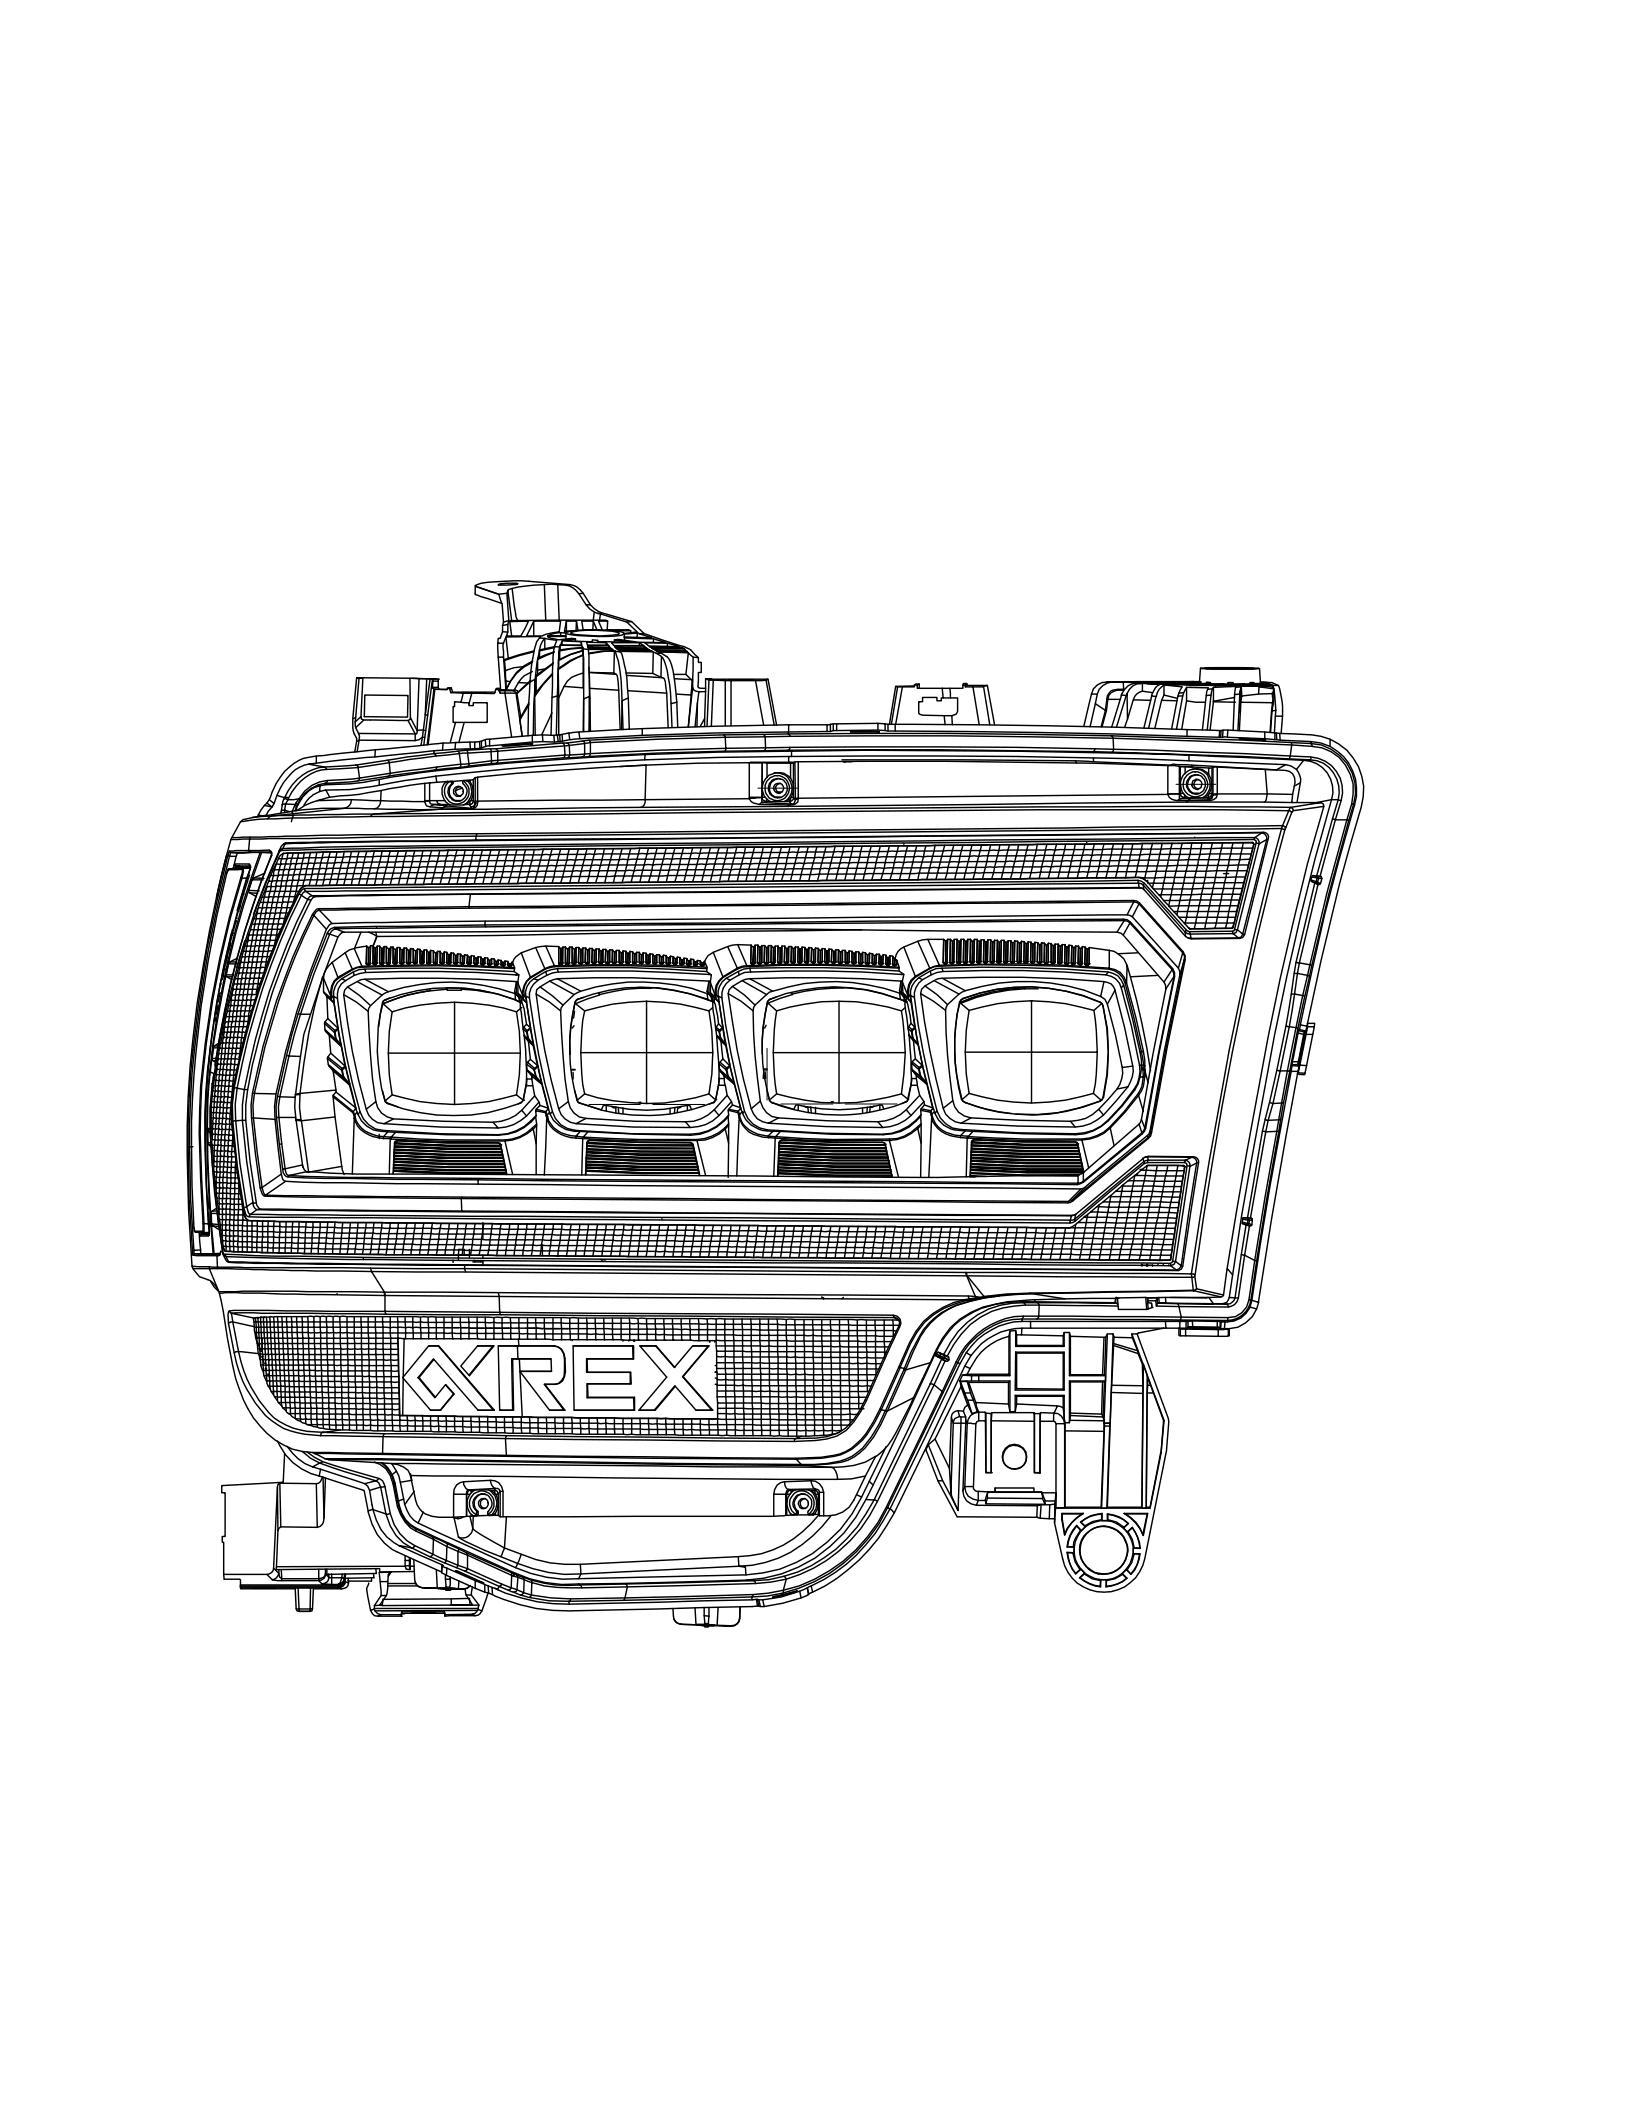 2019 2020 2021 Ram 2500 NOVA-Series Projector Headlights Design